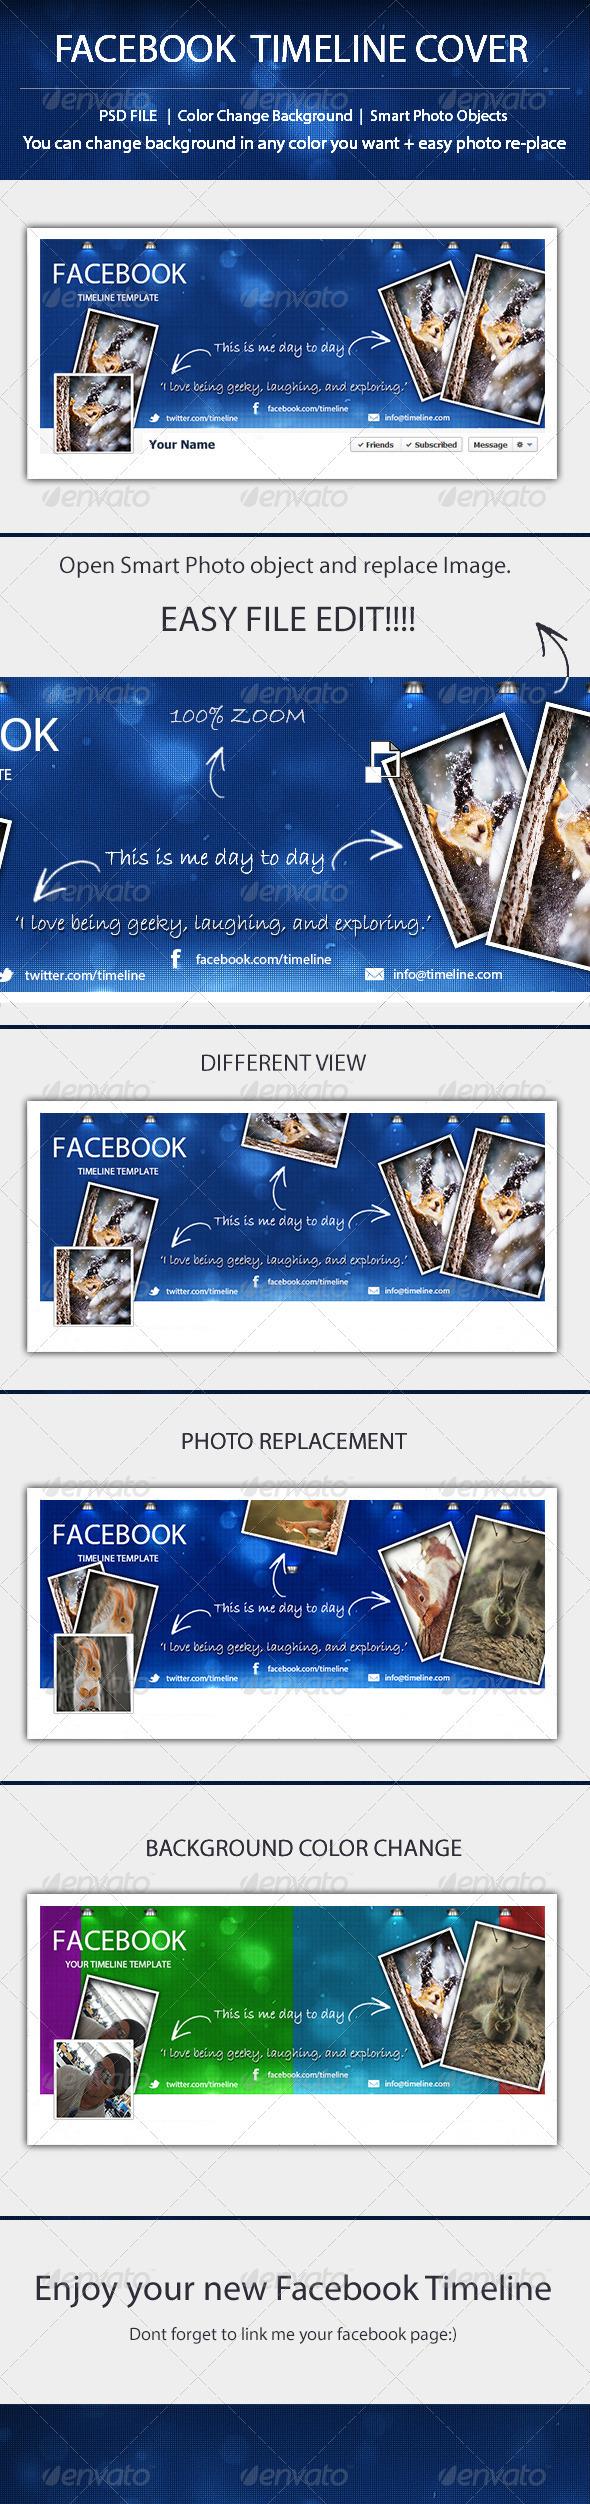 Facbook Timeline Template - Facebook Timeline Covers Social Media